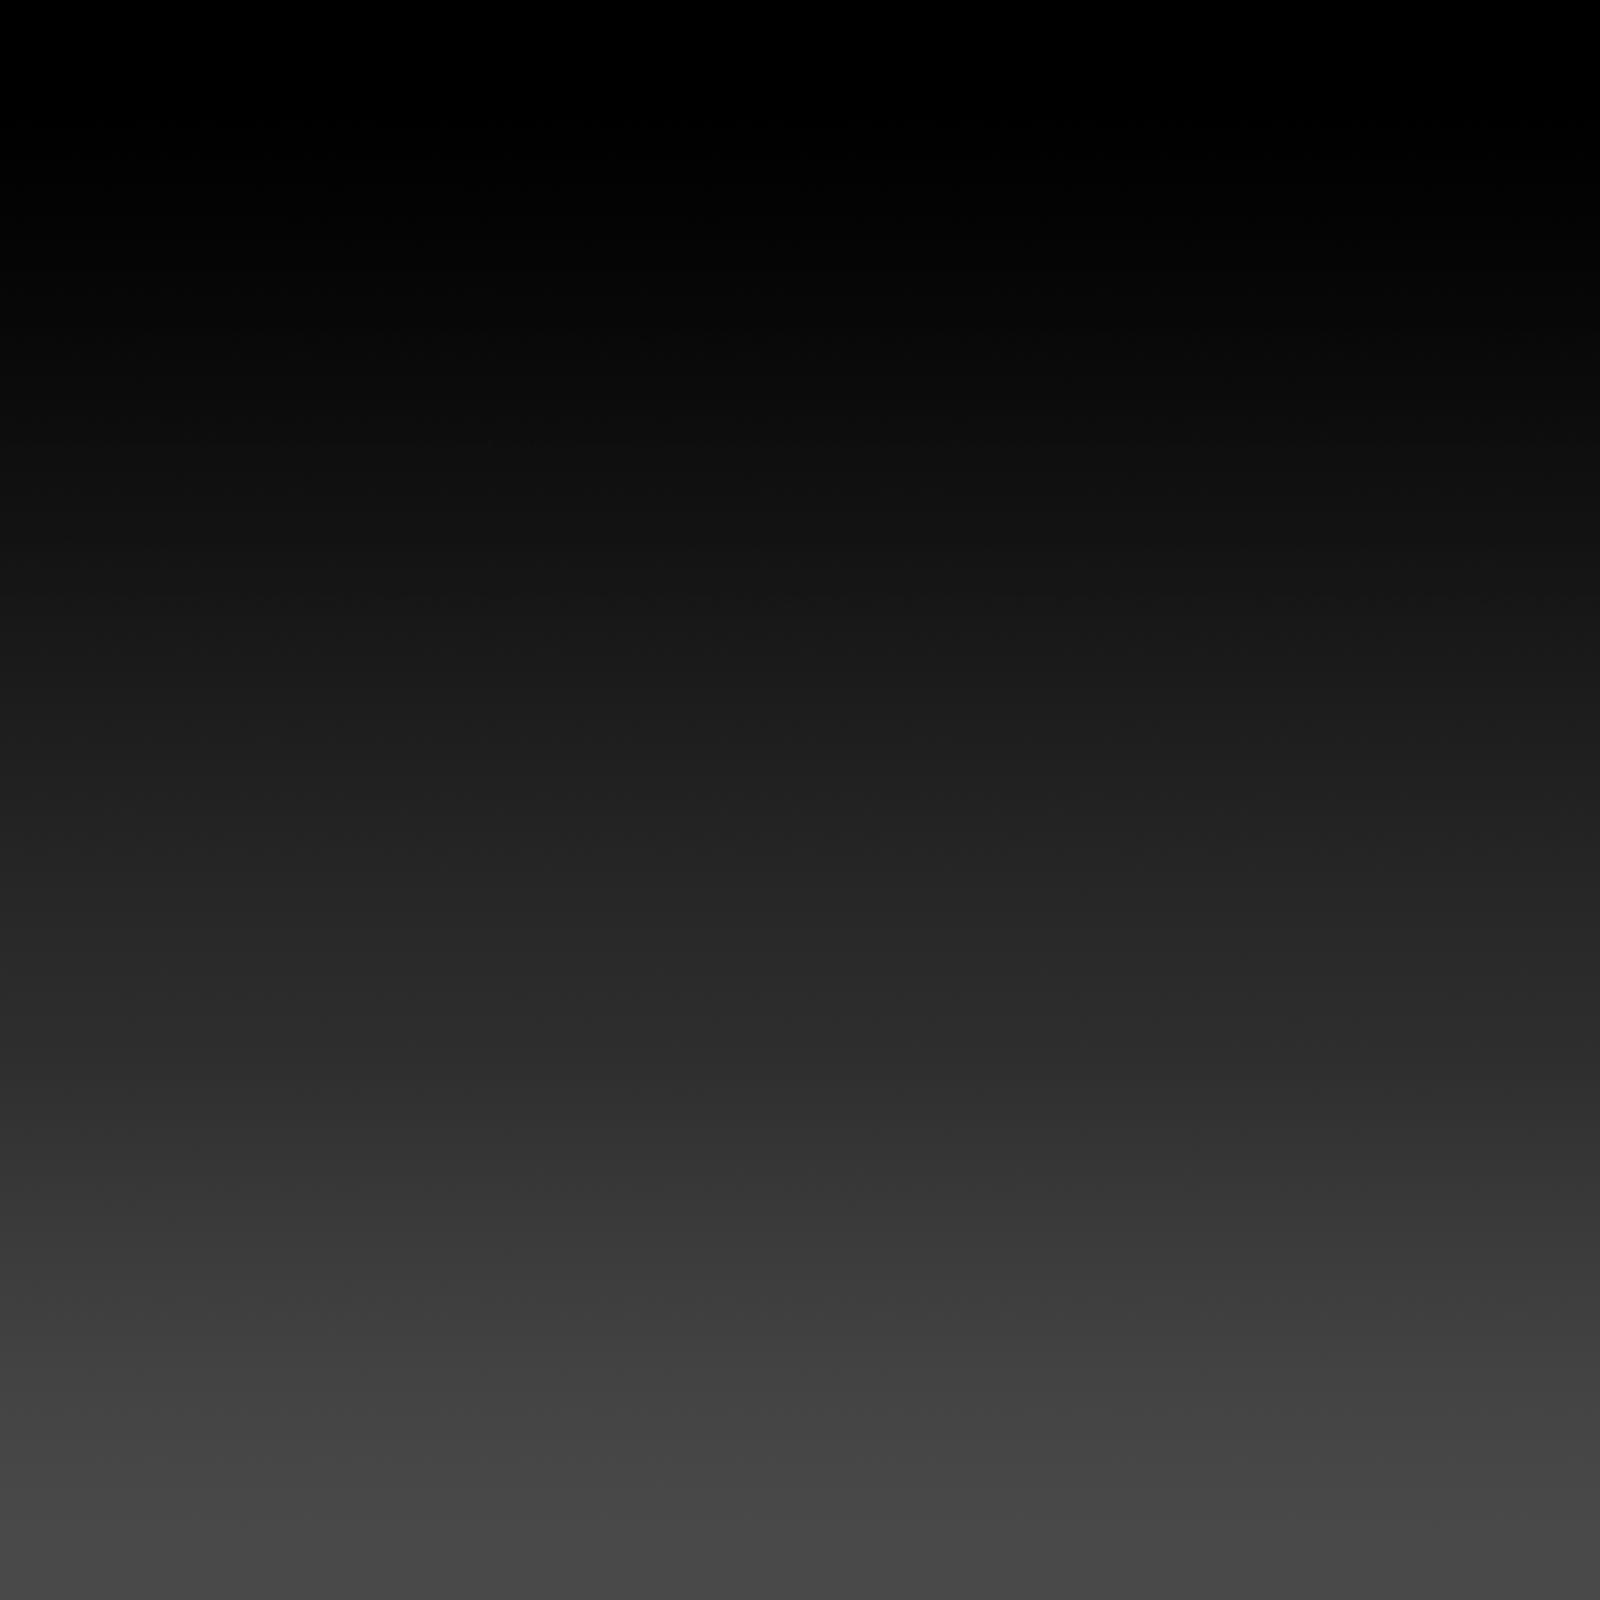 Image Result For Gradient Black Plain Wallpaper Iphone Black Wallpaper Black Wallpaper Iphone